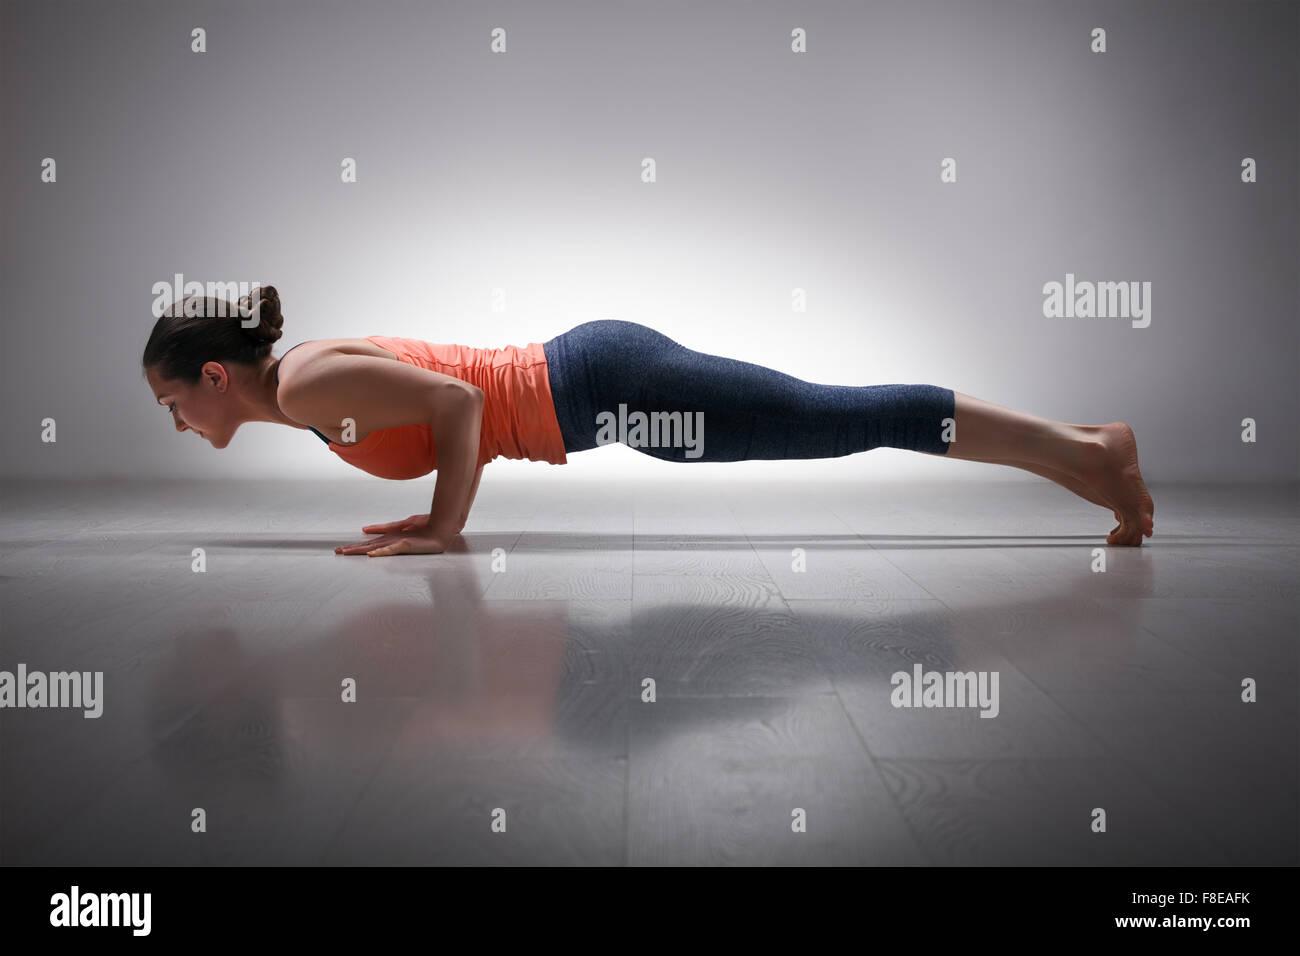 Woman practices yoga asana Chaturanga Dandasana - Stock Image